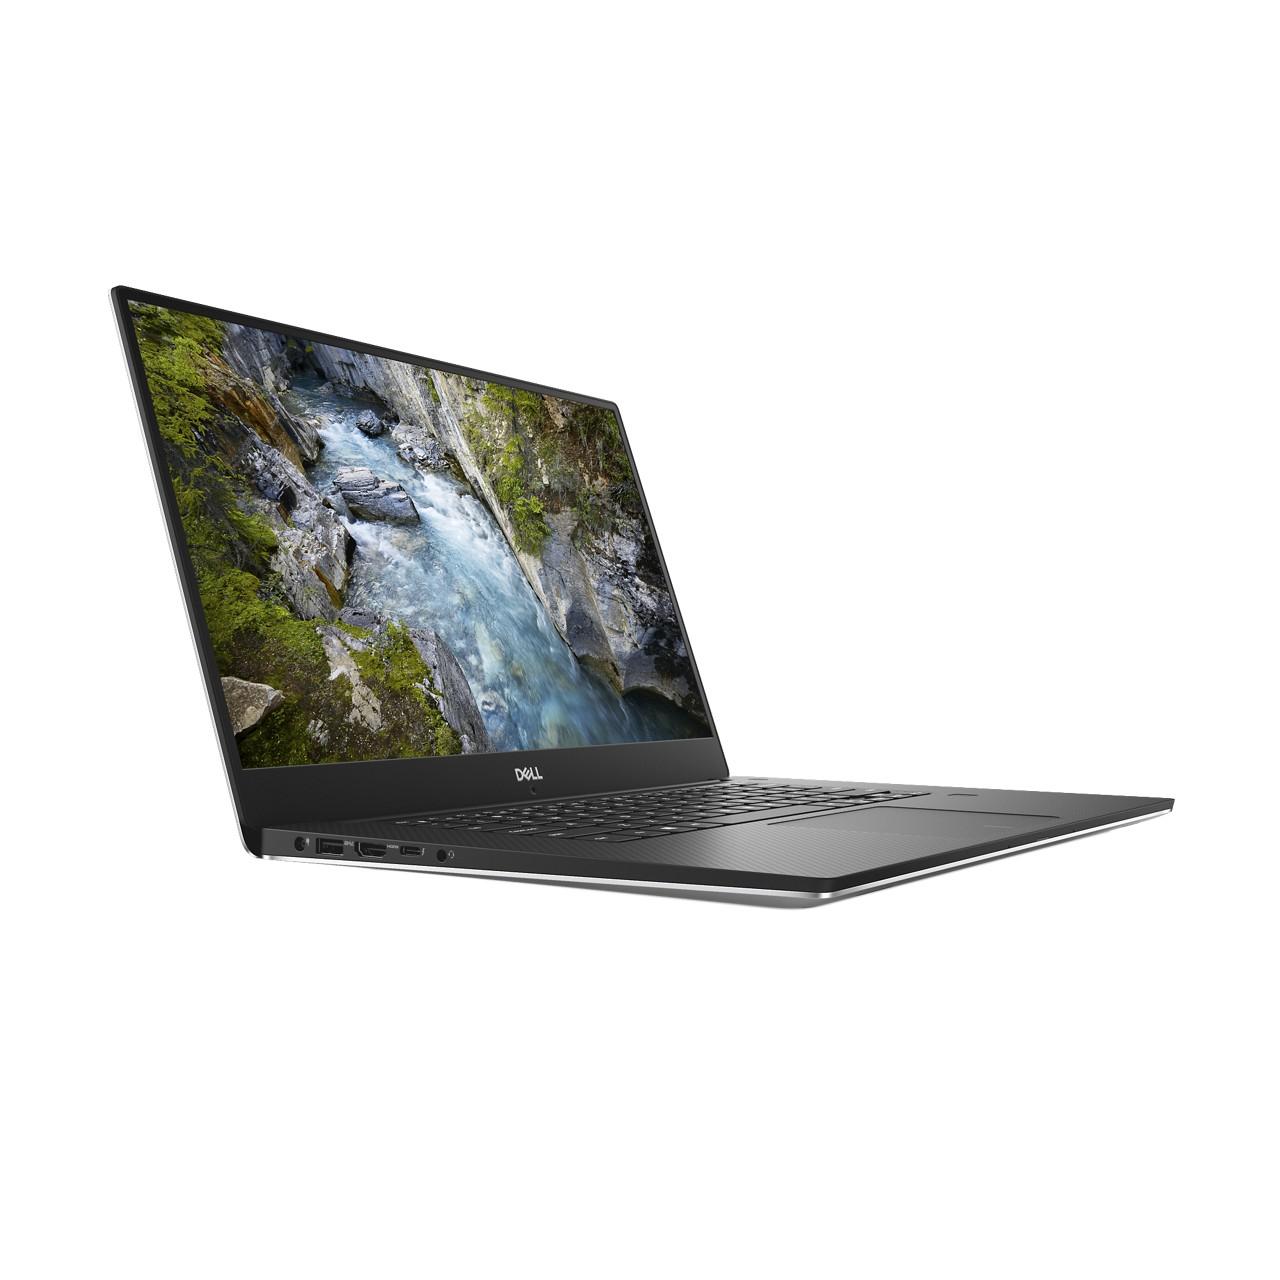 Dell XPS 15 9570 Laptop 15 6